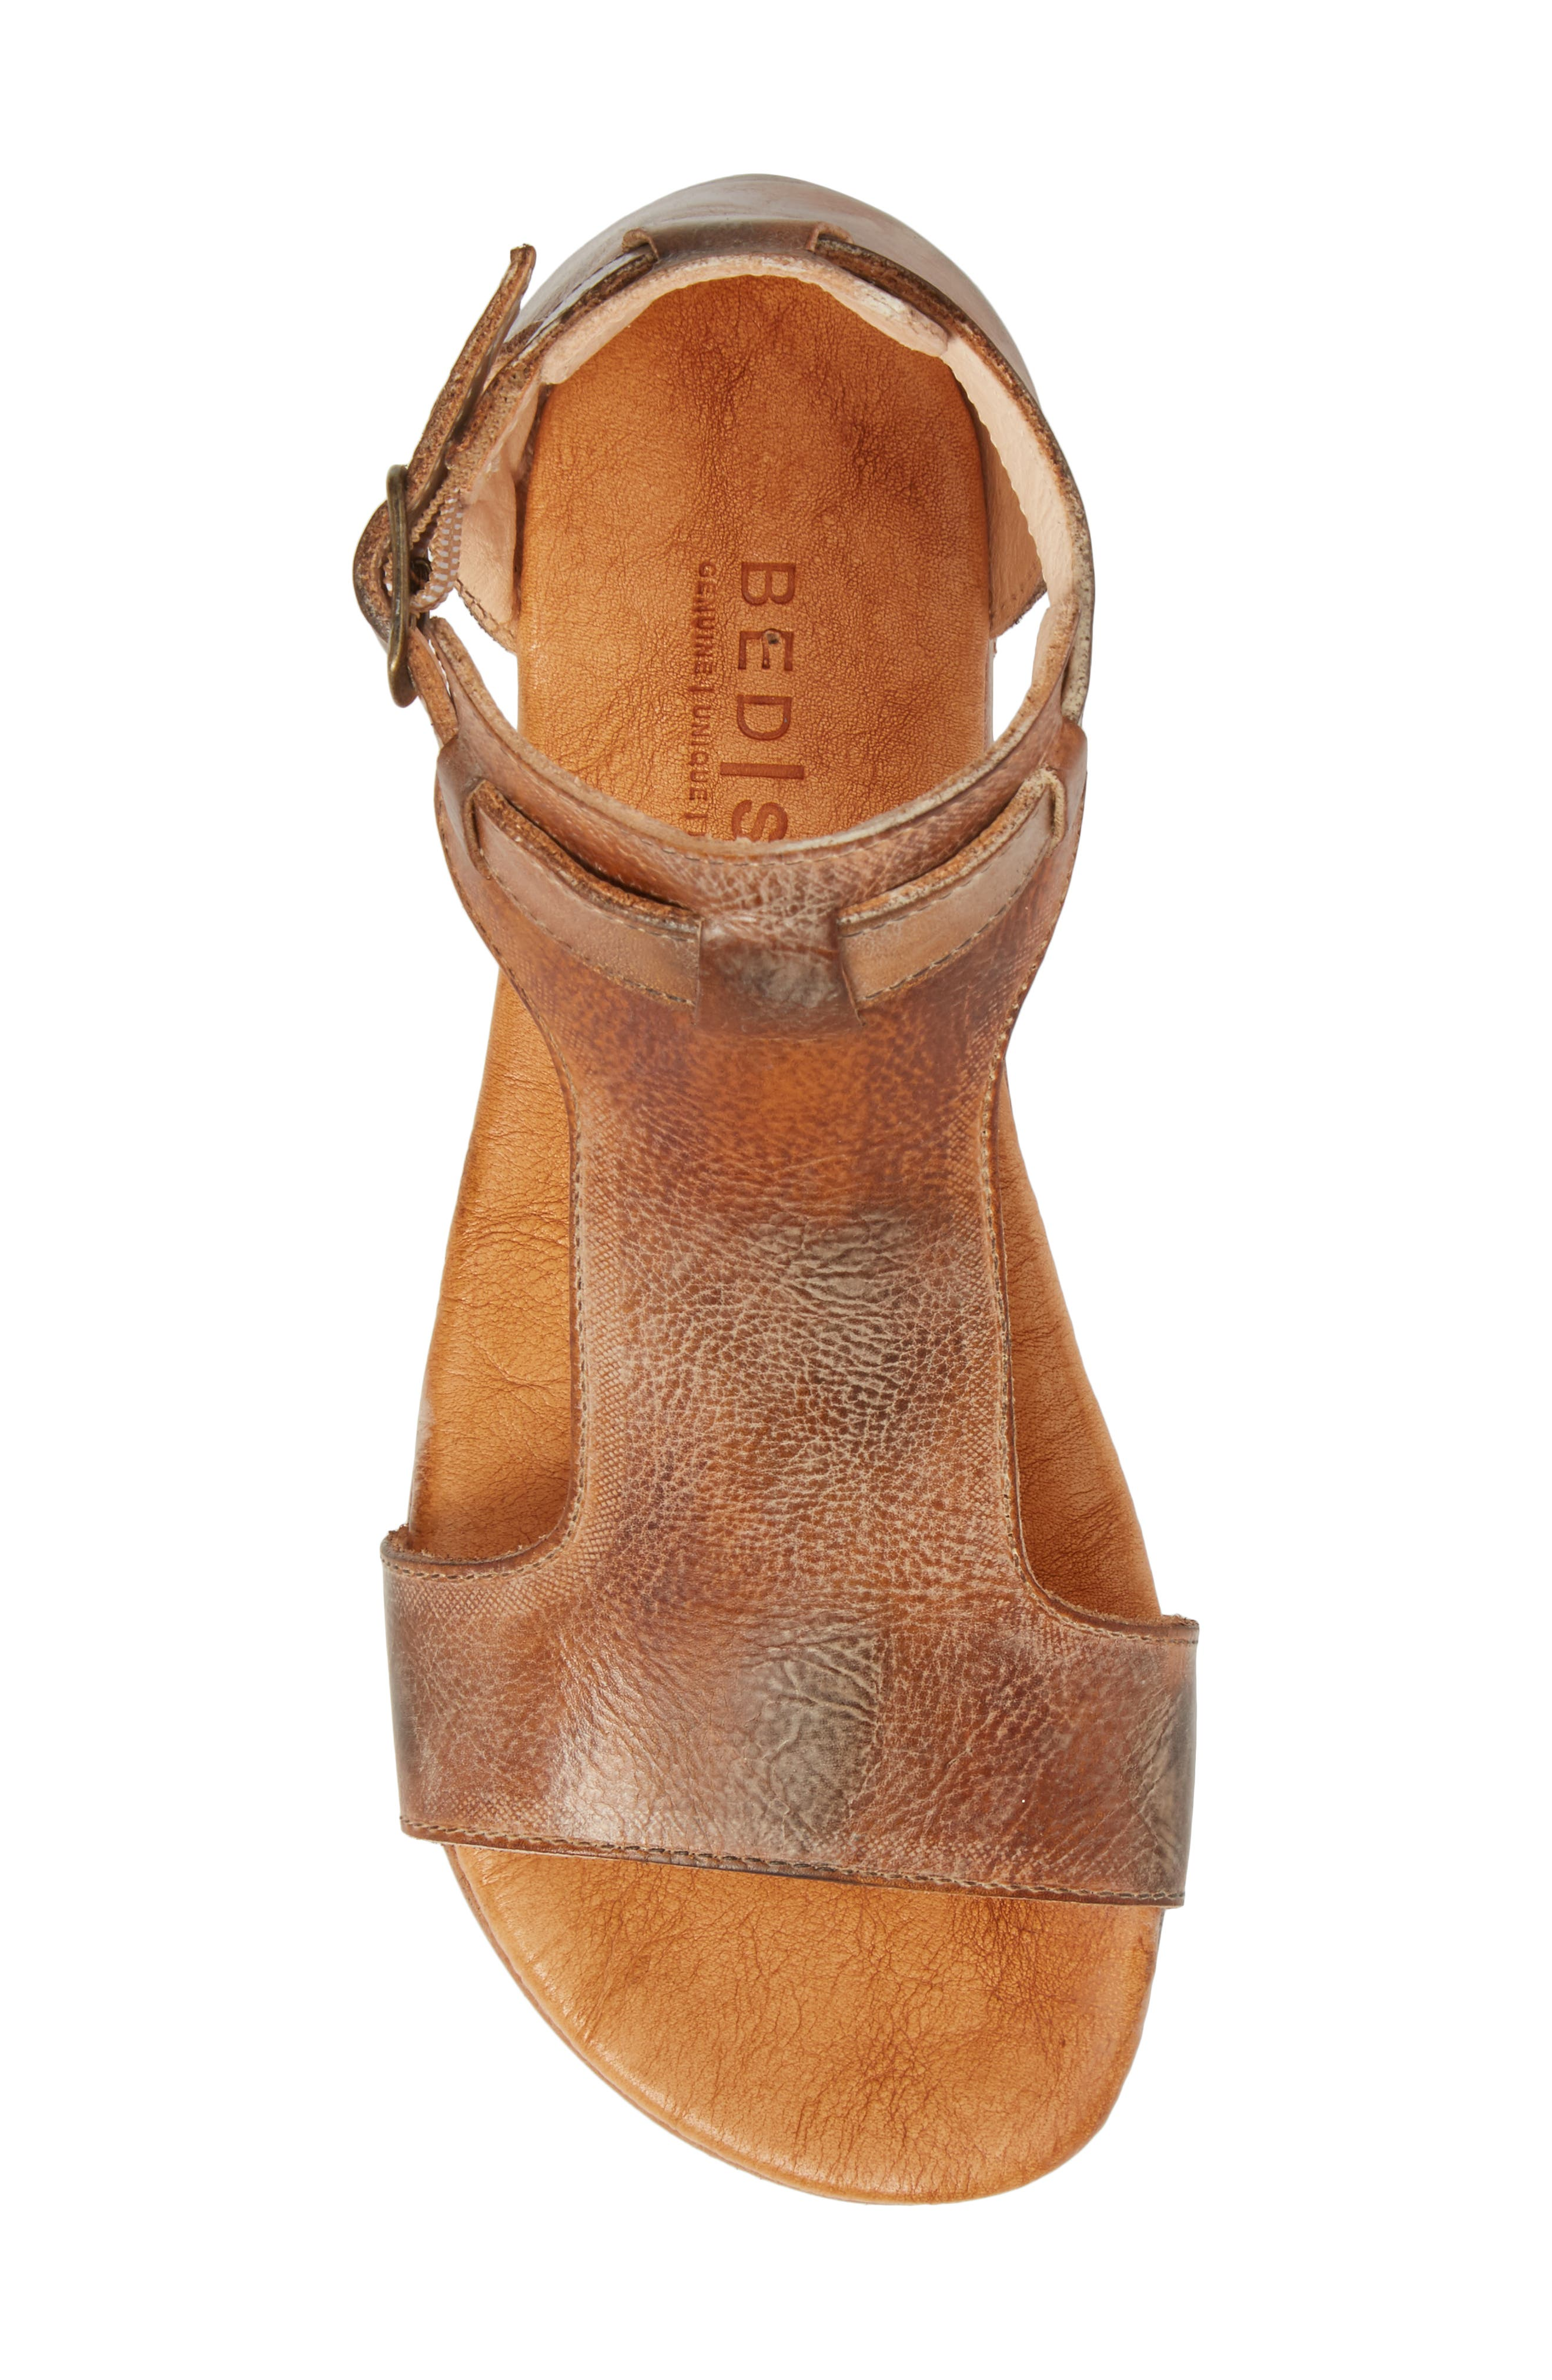 Sable Sandal,                             Alternate thumbnail 5, color,                             Tan/ White Leather